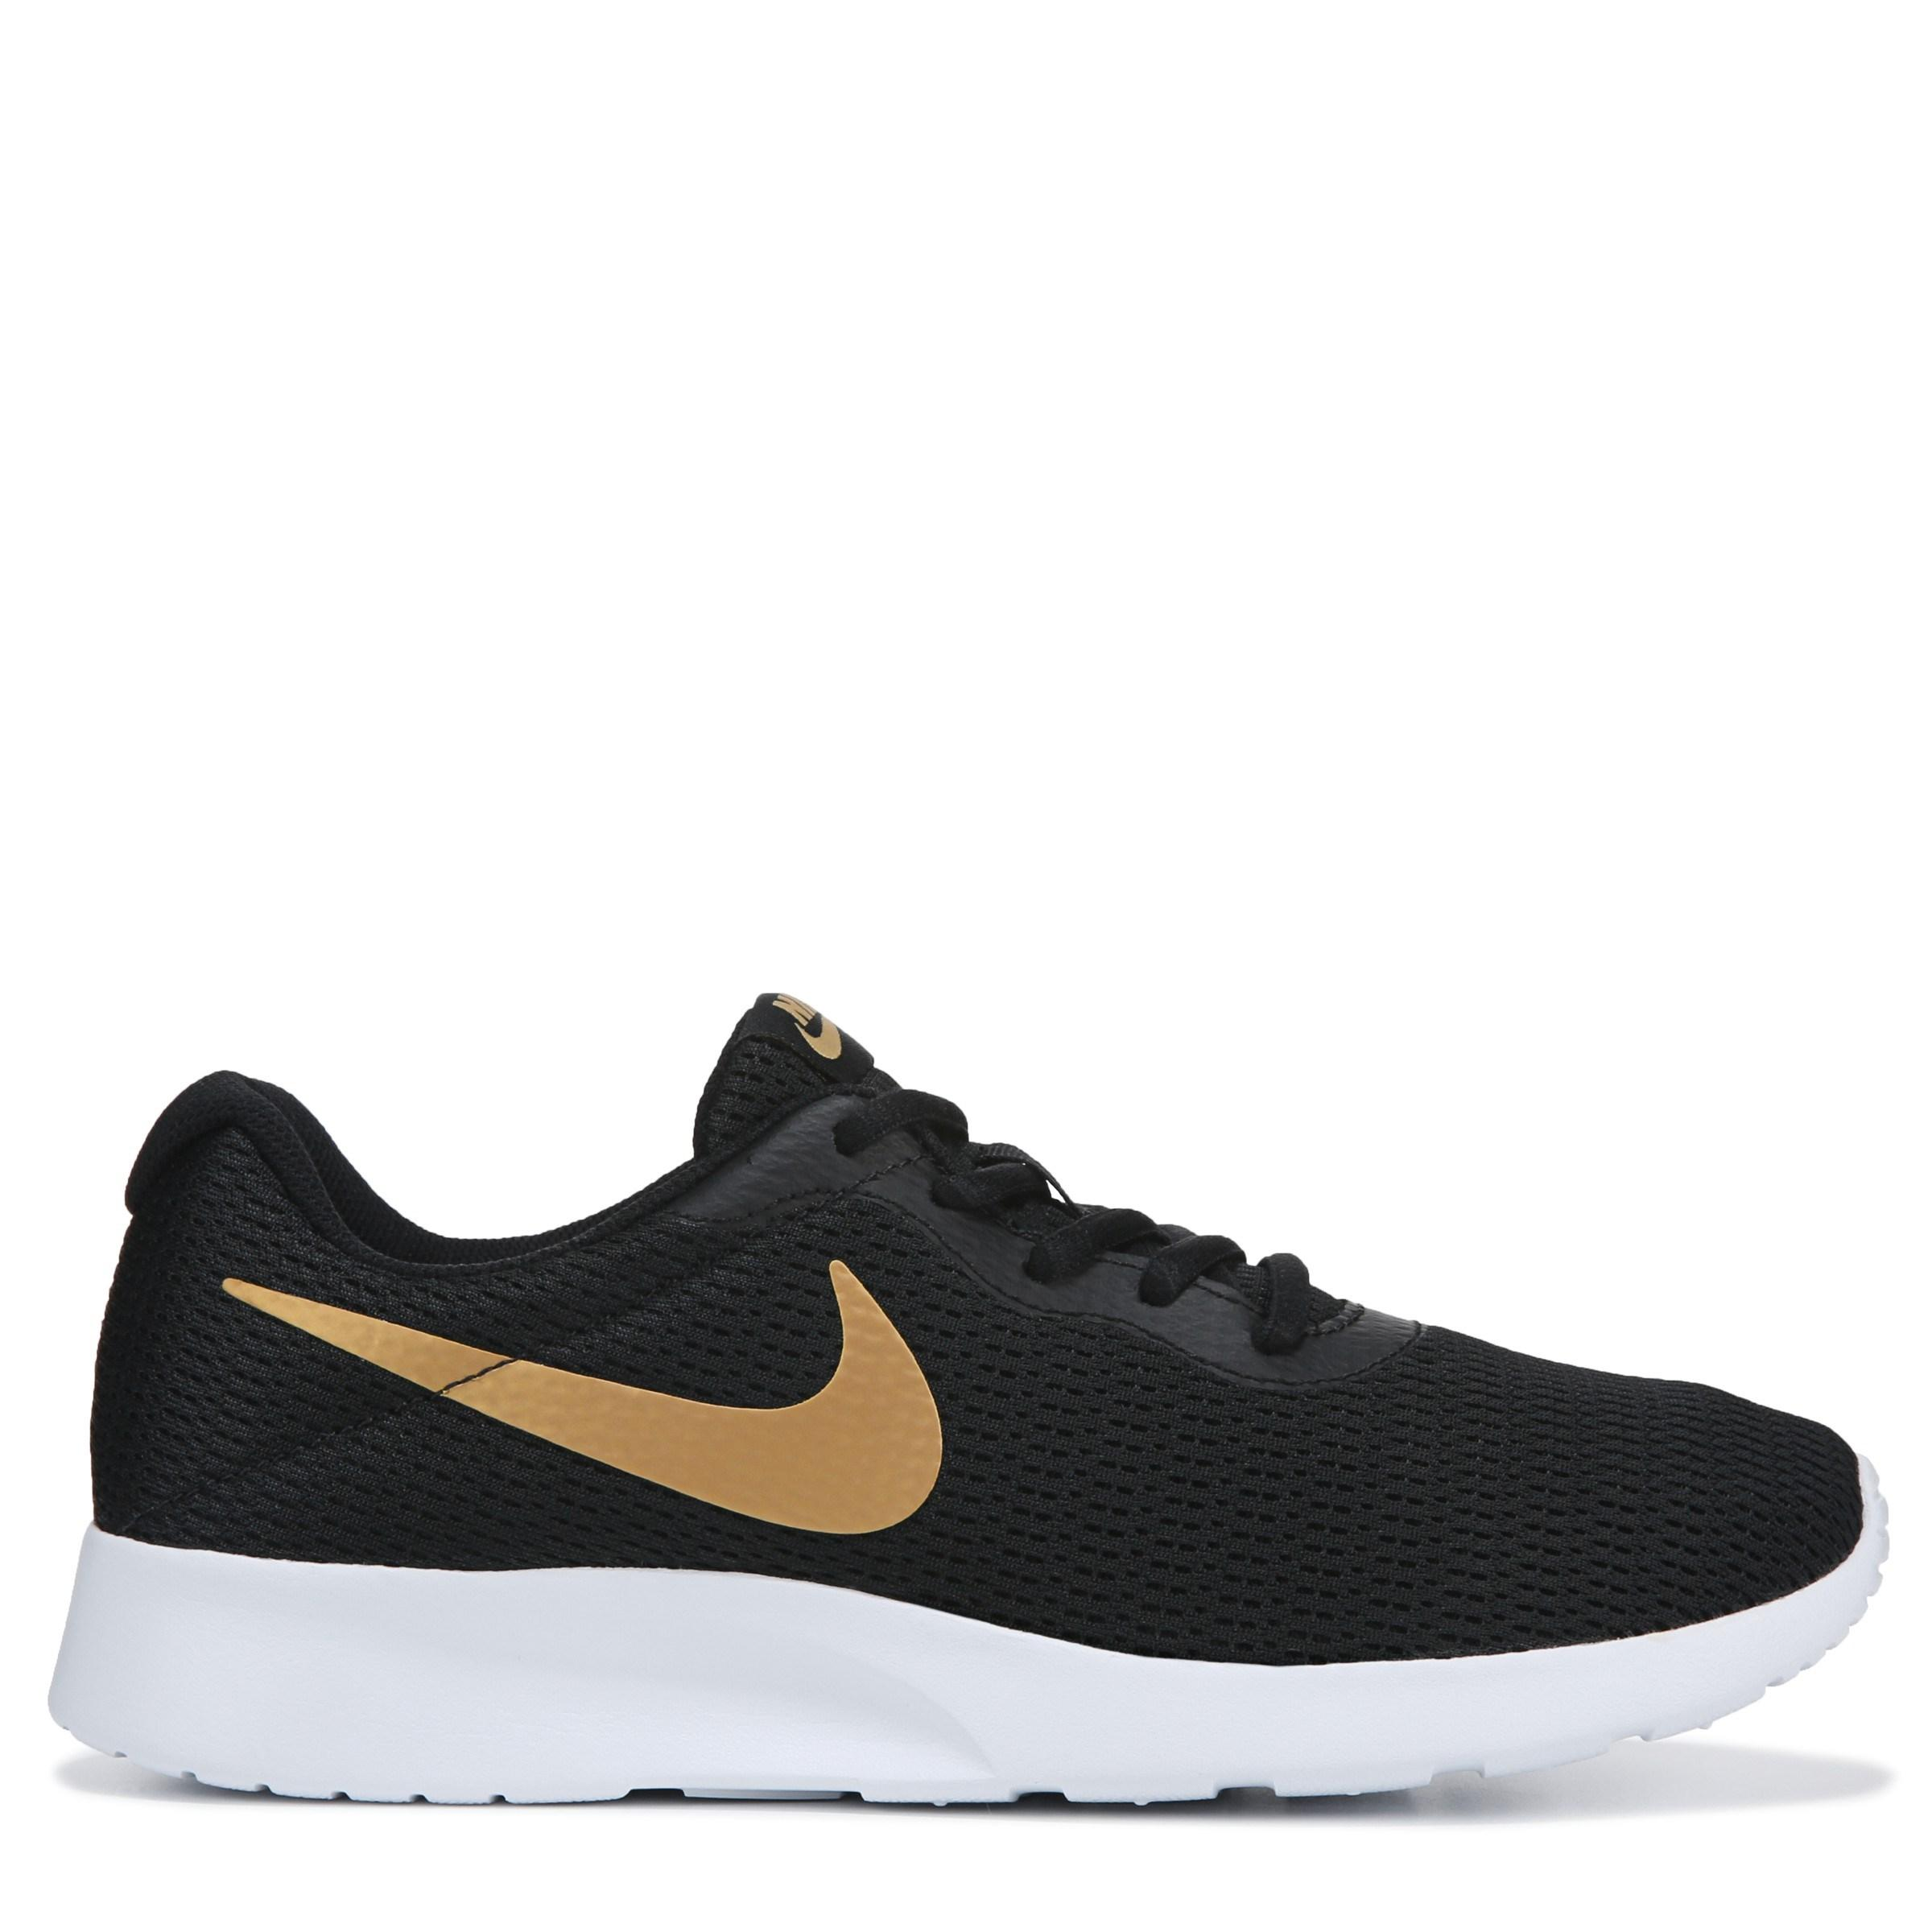 Nike Tanjun Sneakers in Black/Gold